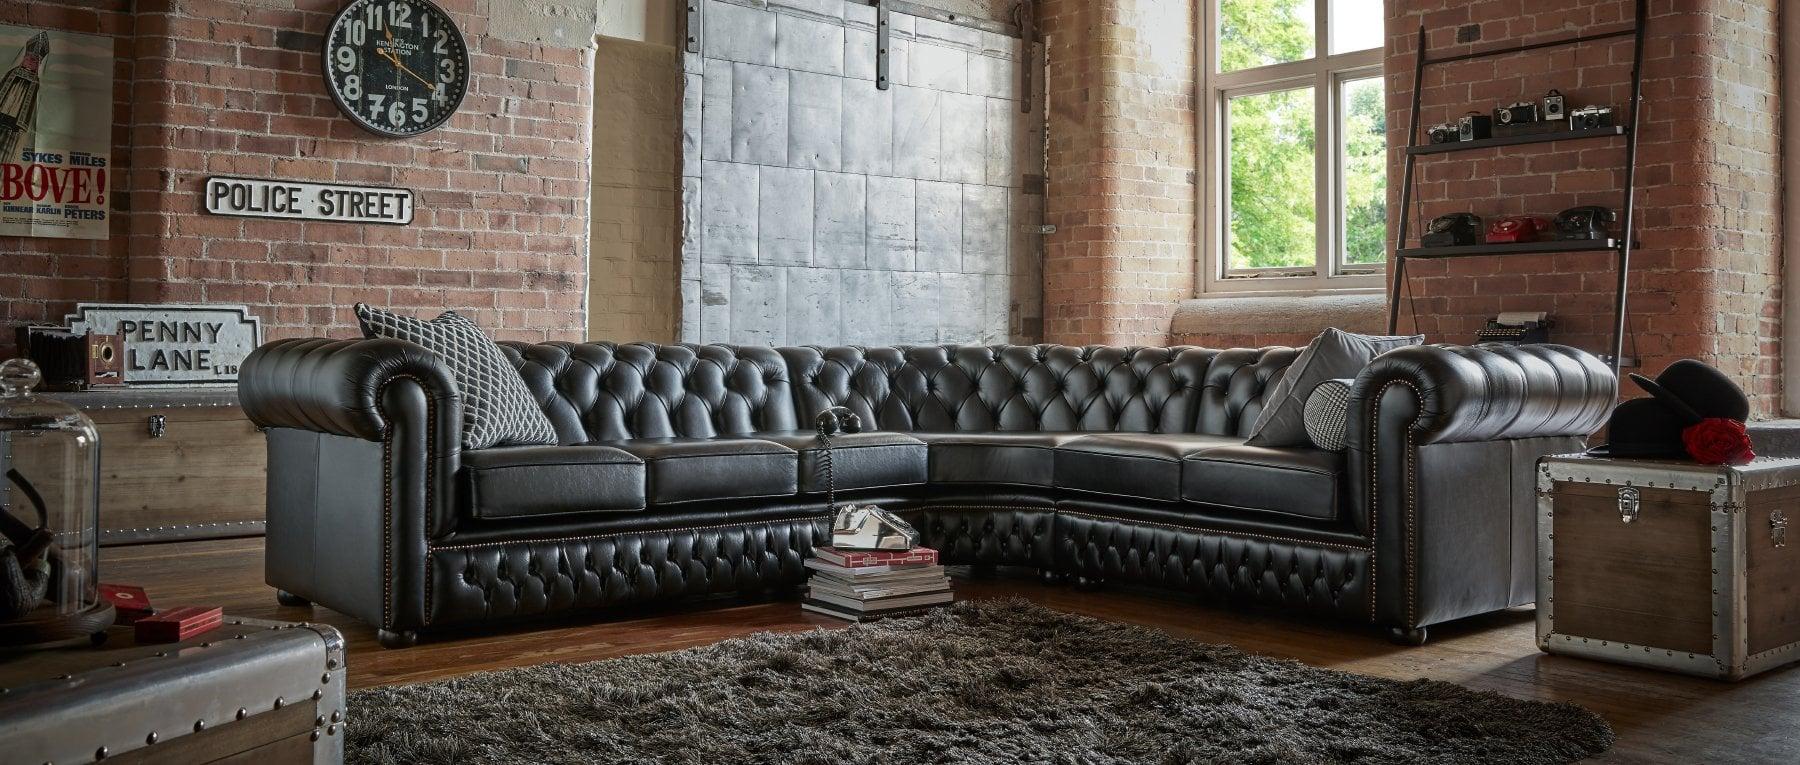 Enjoyable Timeless Chesterfields Handcrafted Artisan Furniture Cjindustries Chair Design For Home Cjindustriesco